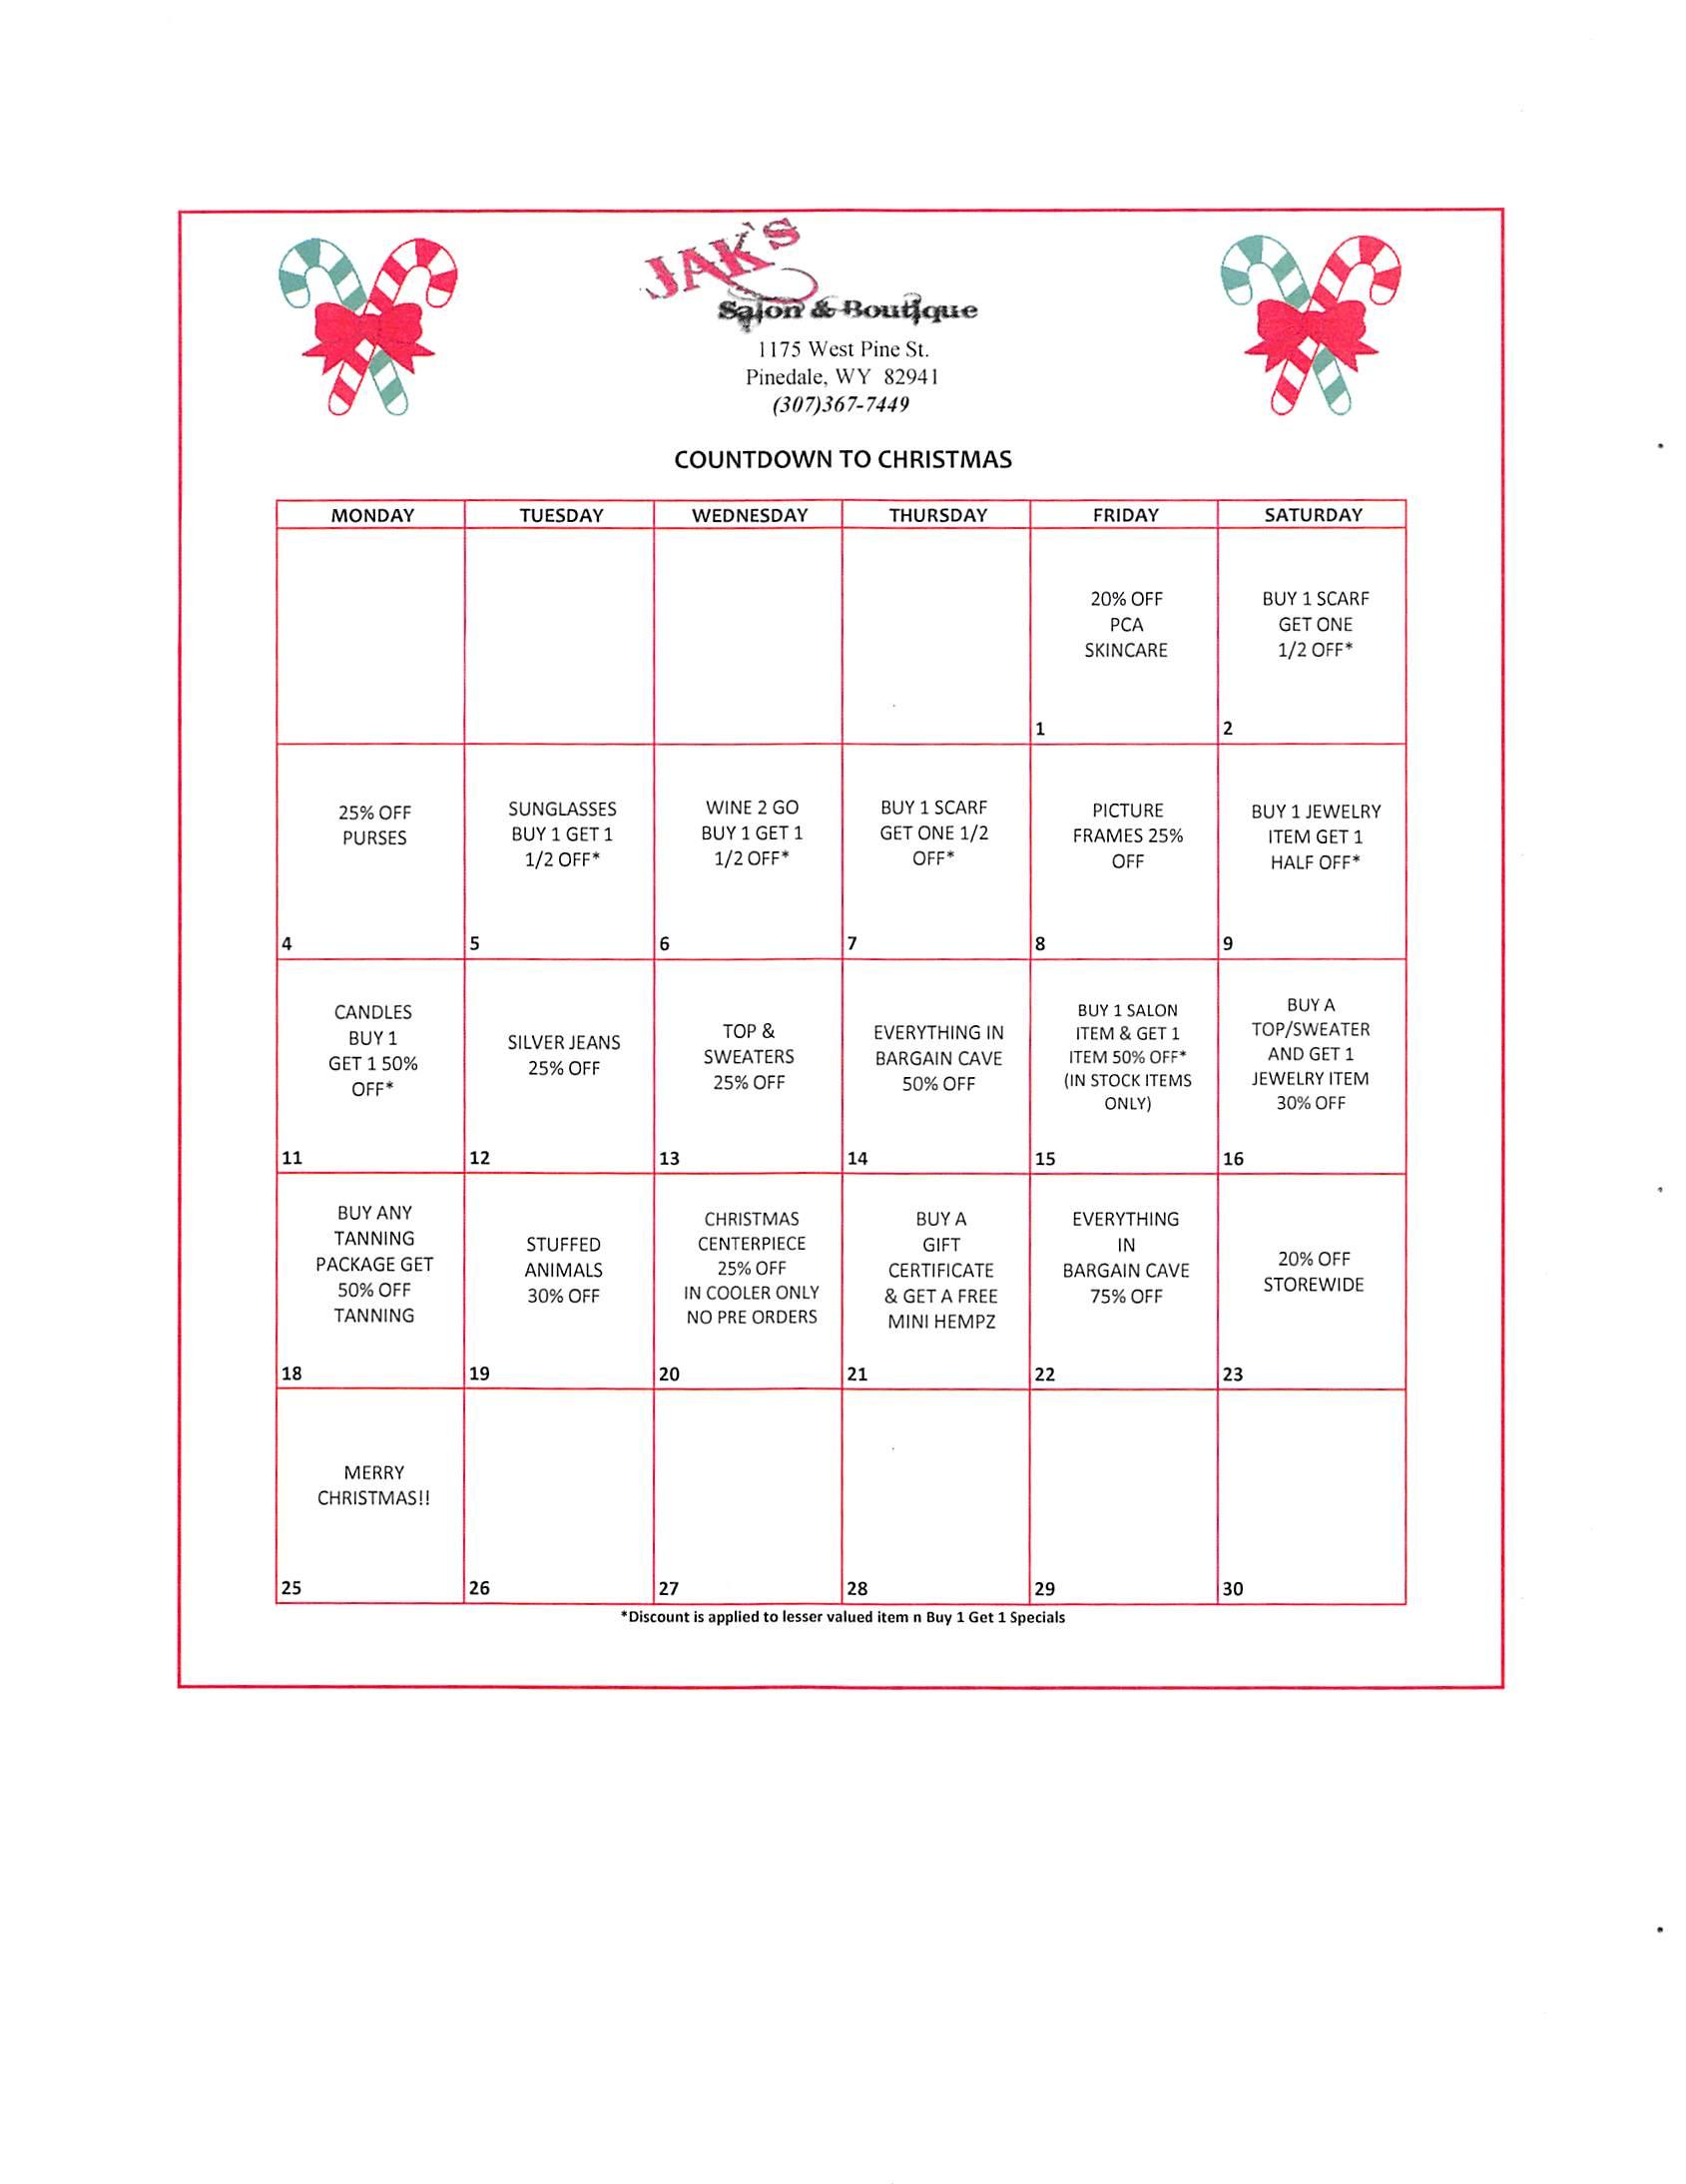 jaks-christmas-calendar